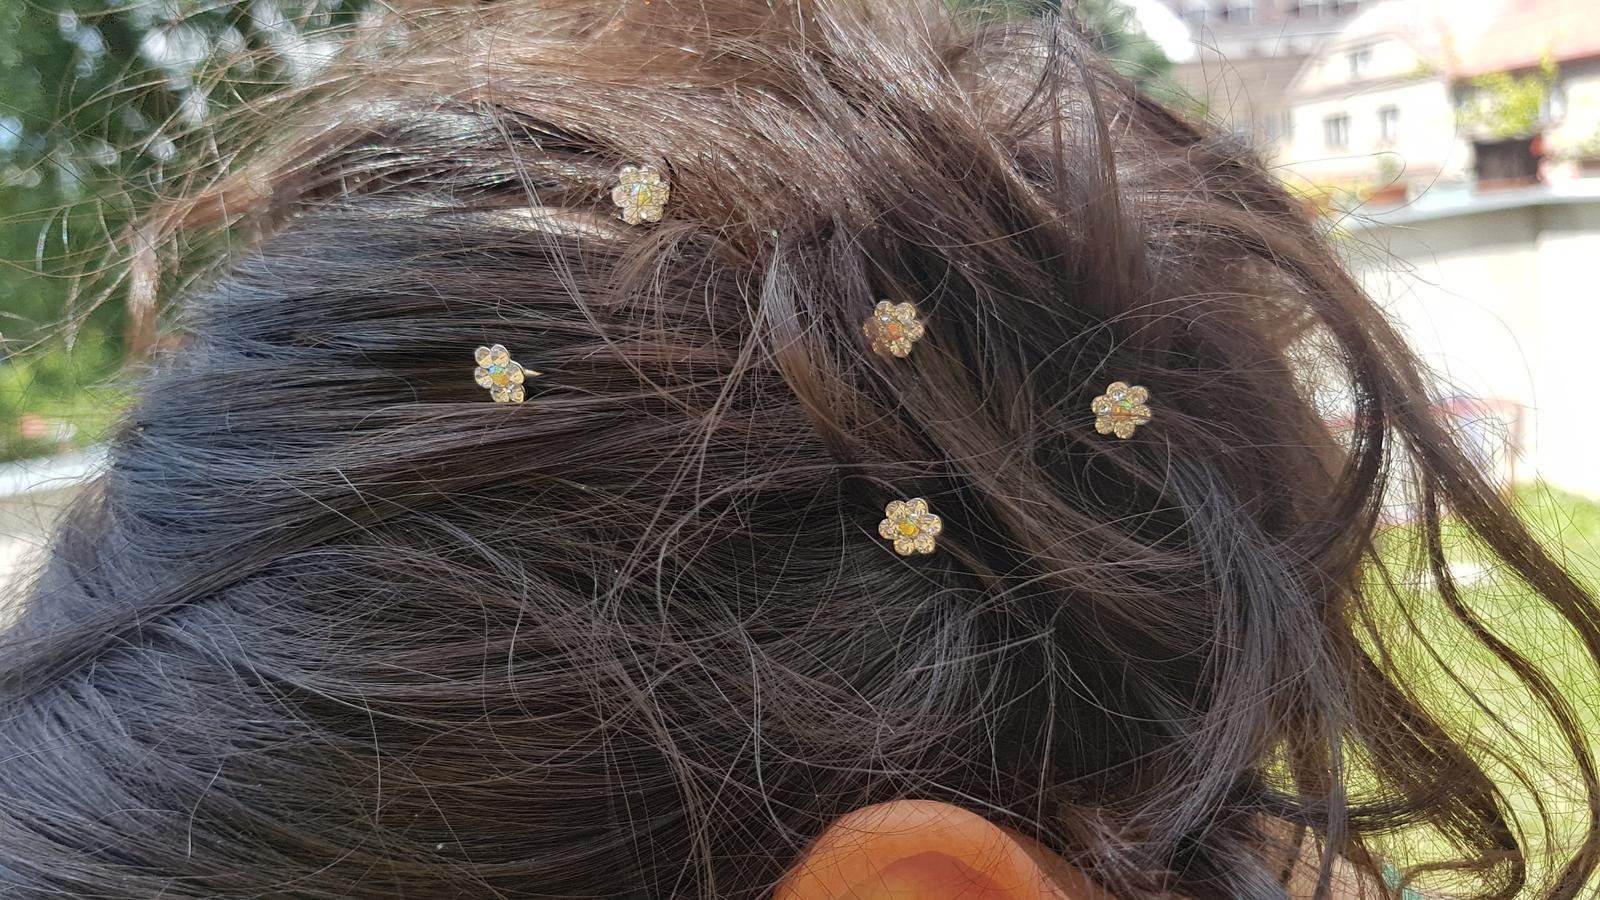 Kytičky do vlasů z kamínků drobné malé - Obrázek č. 2